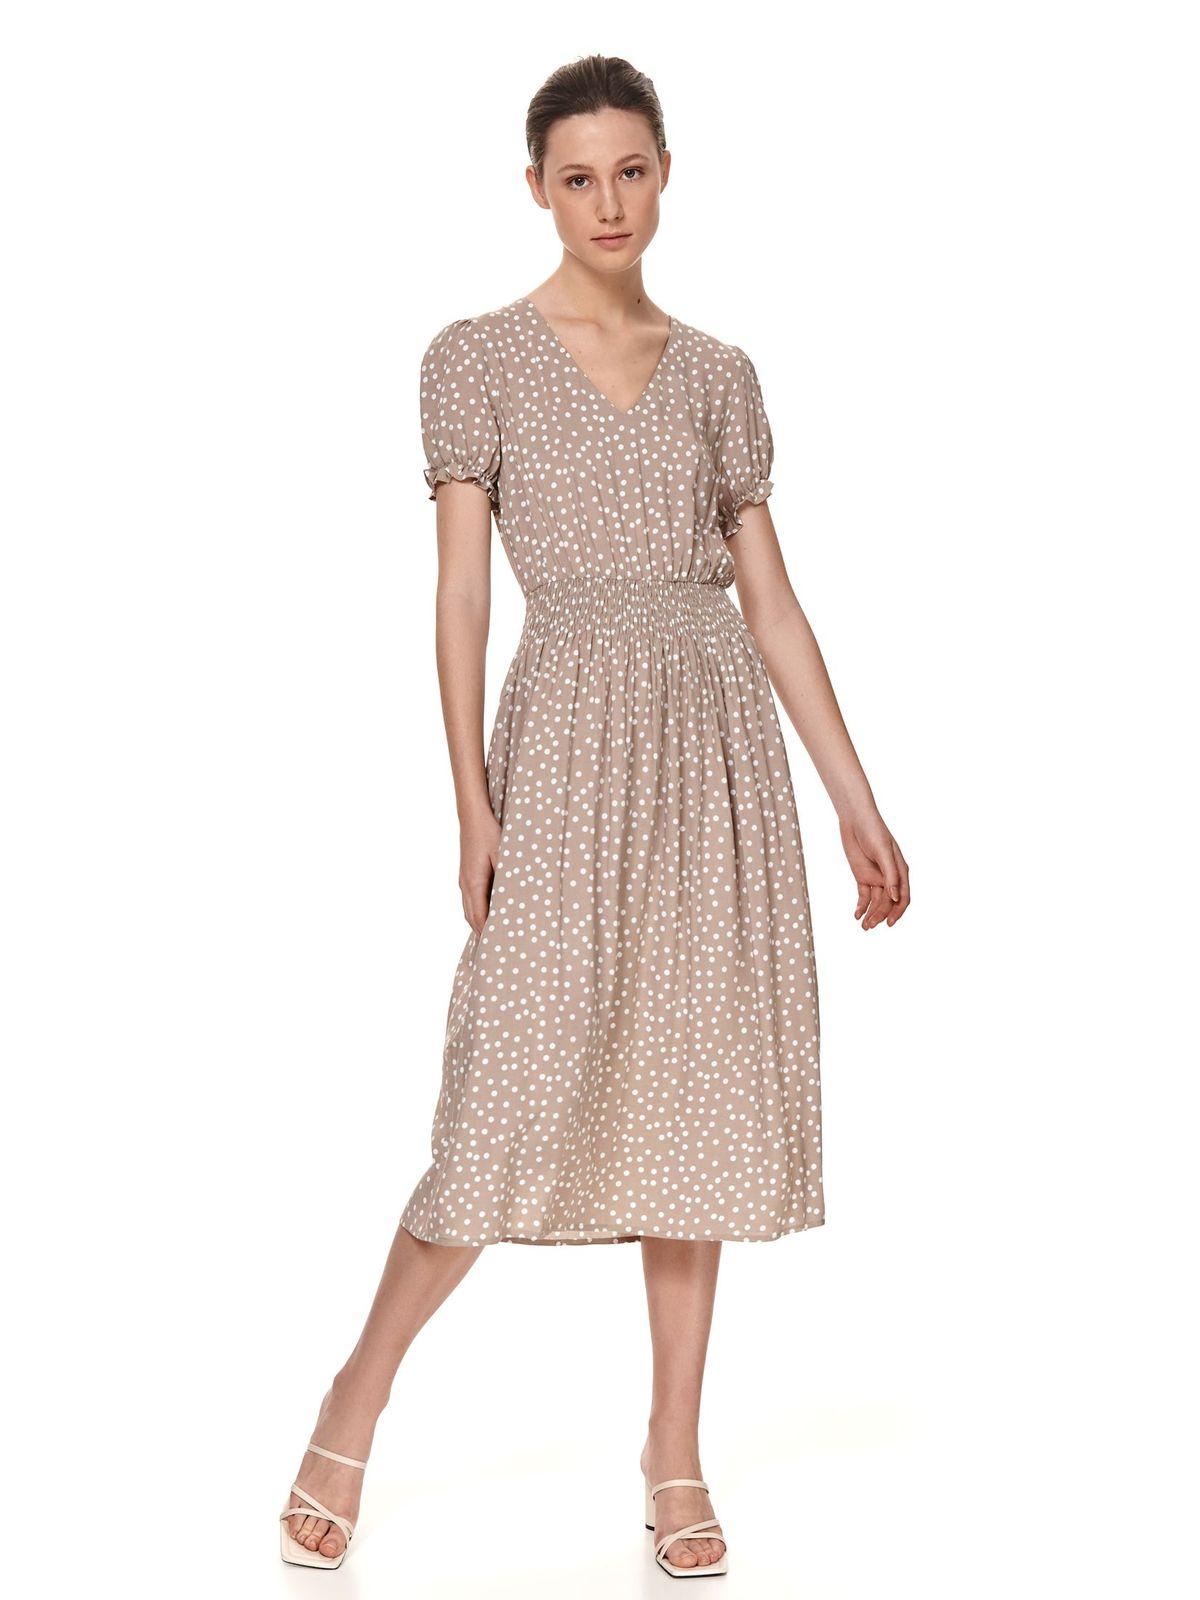 Peach dress midi cloche with elastic waist airy fabric